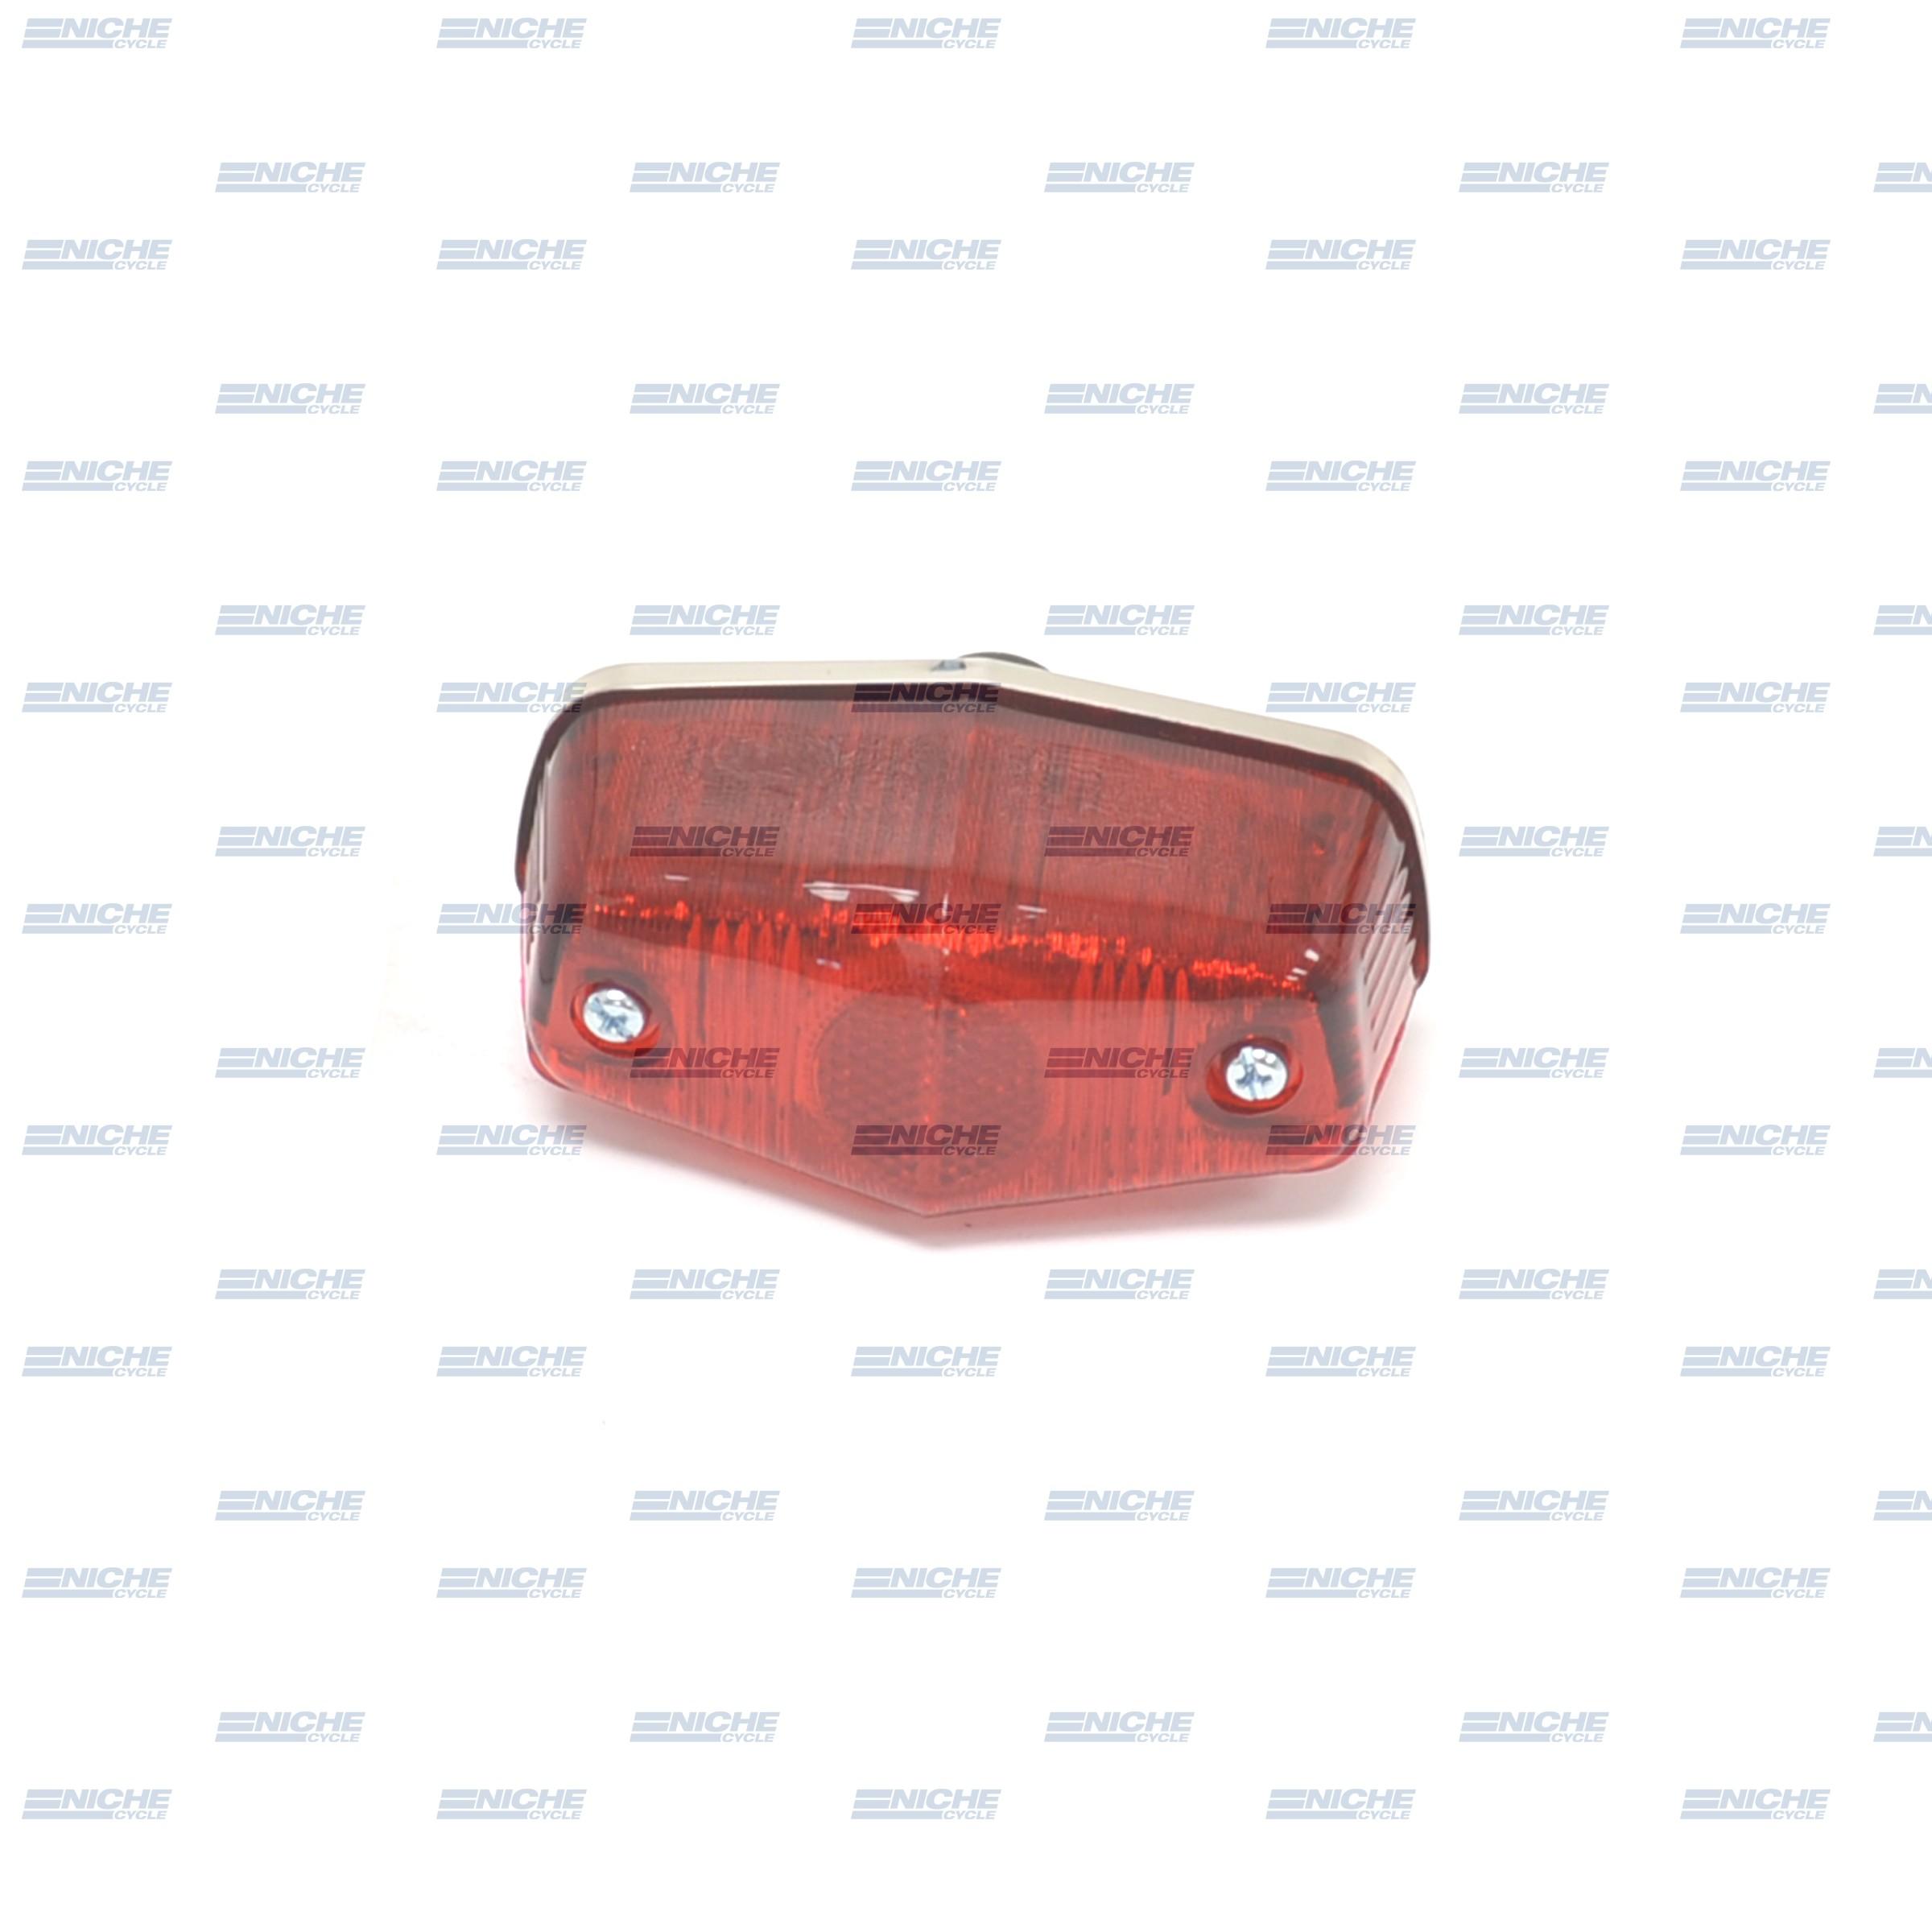 Triumph BSA Norton Classic Lucas-Style Small 6-Volt Chrome Taillight  62-21526